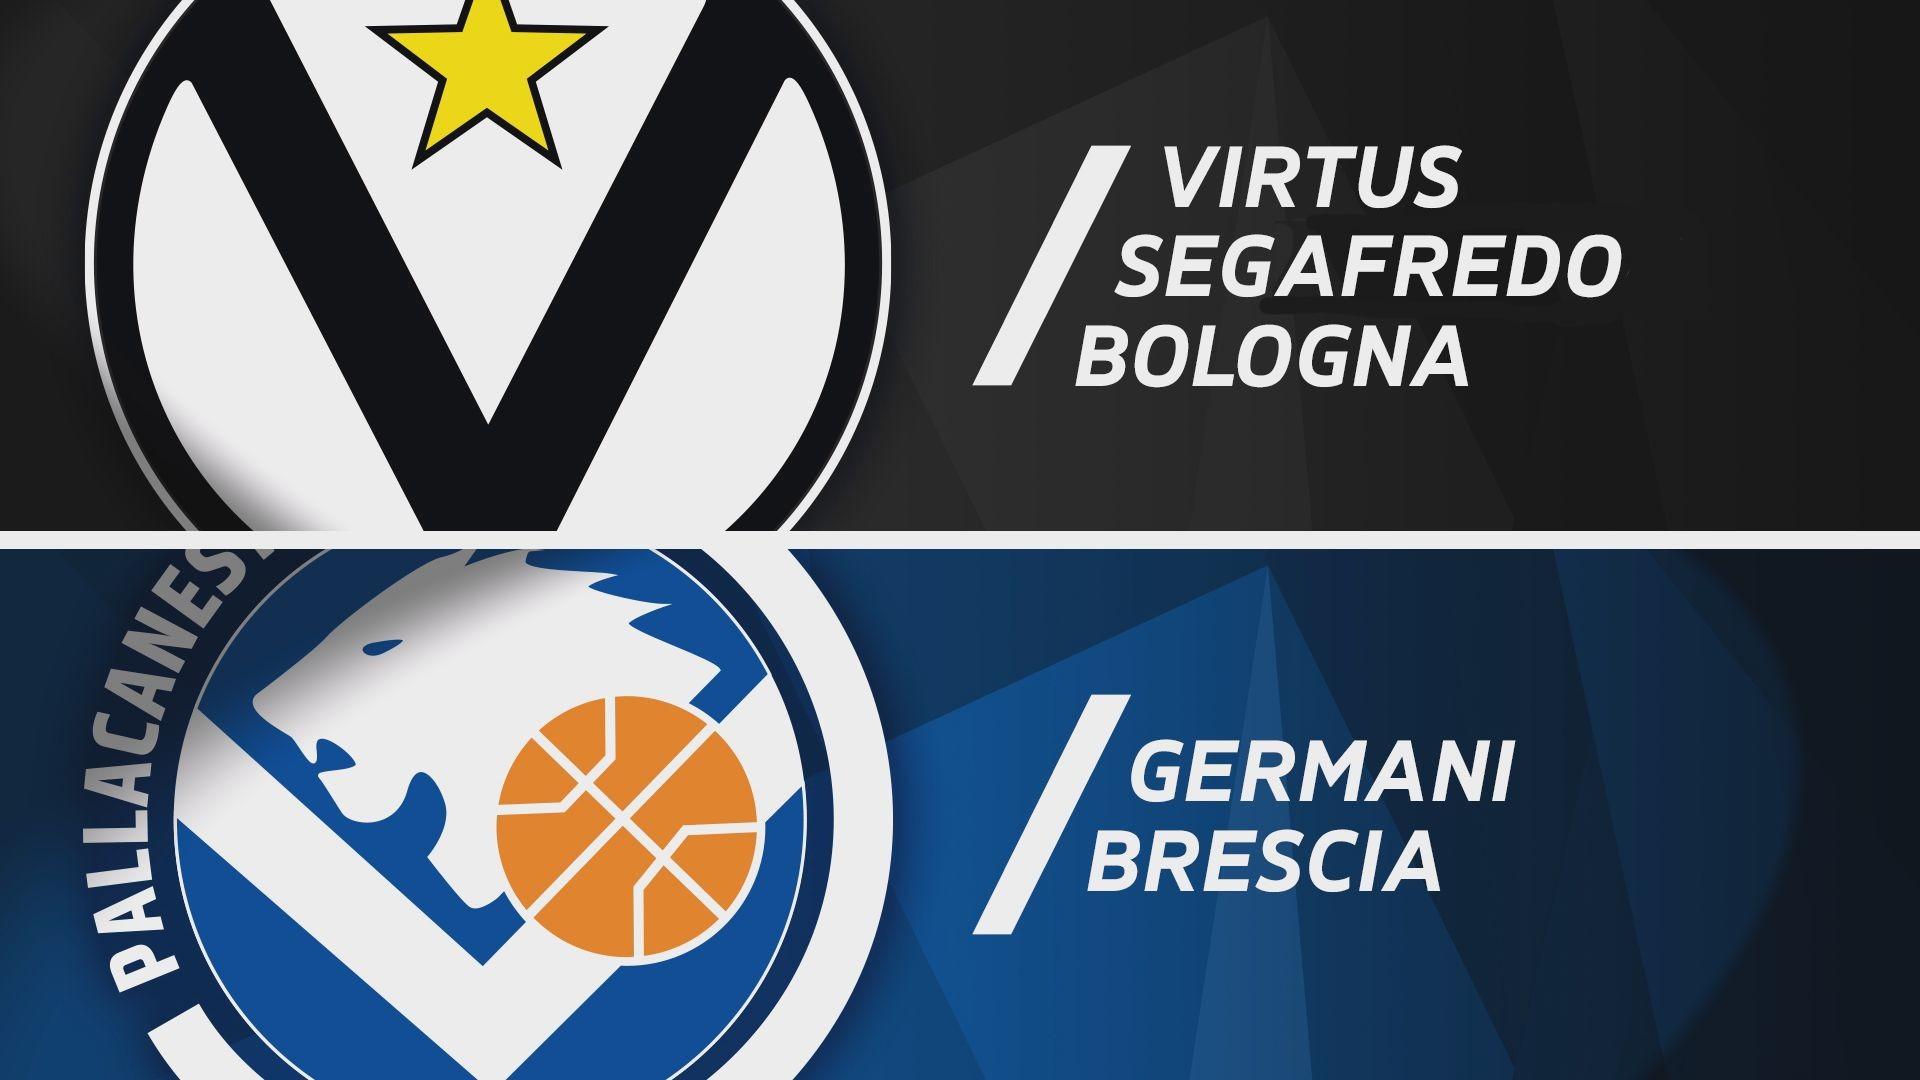 Virtus Segafredo Bologna - Germani Brescia 89-90